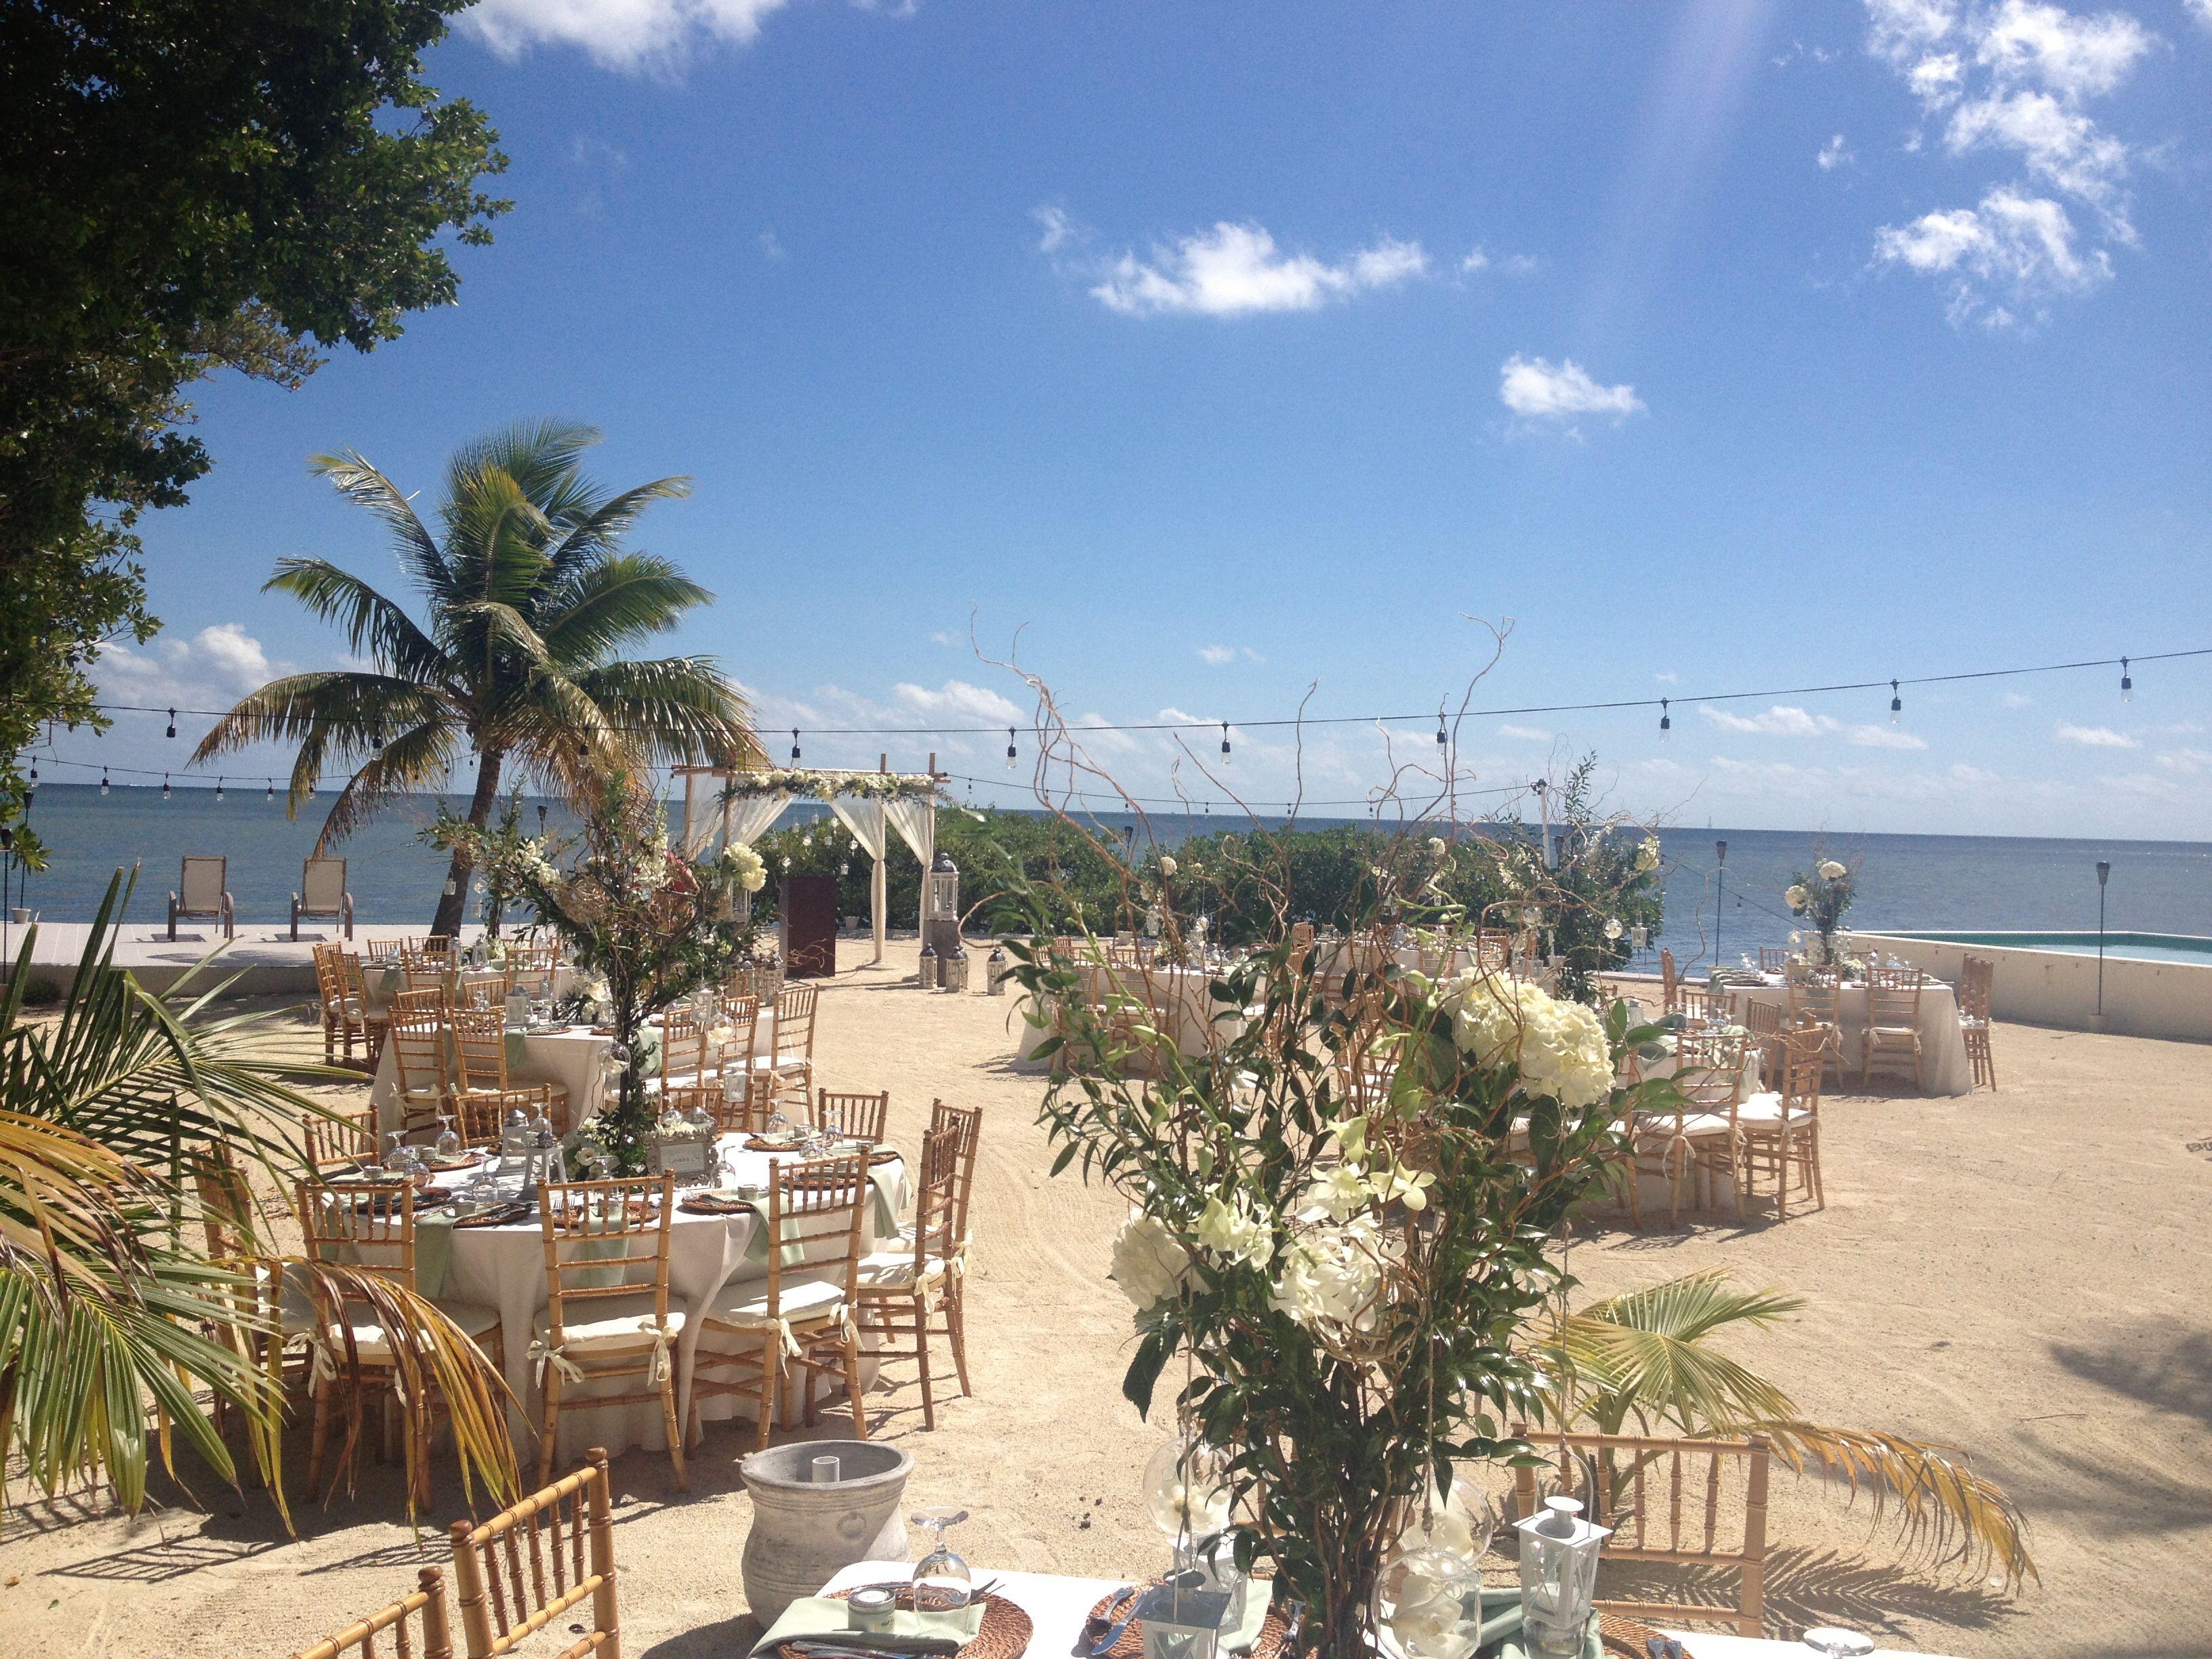 Wedding set up by Duarte Floral Design